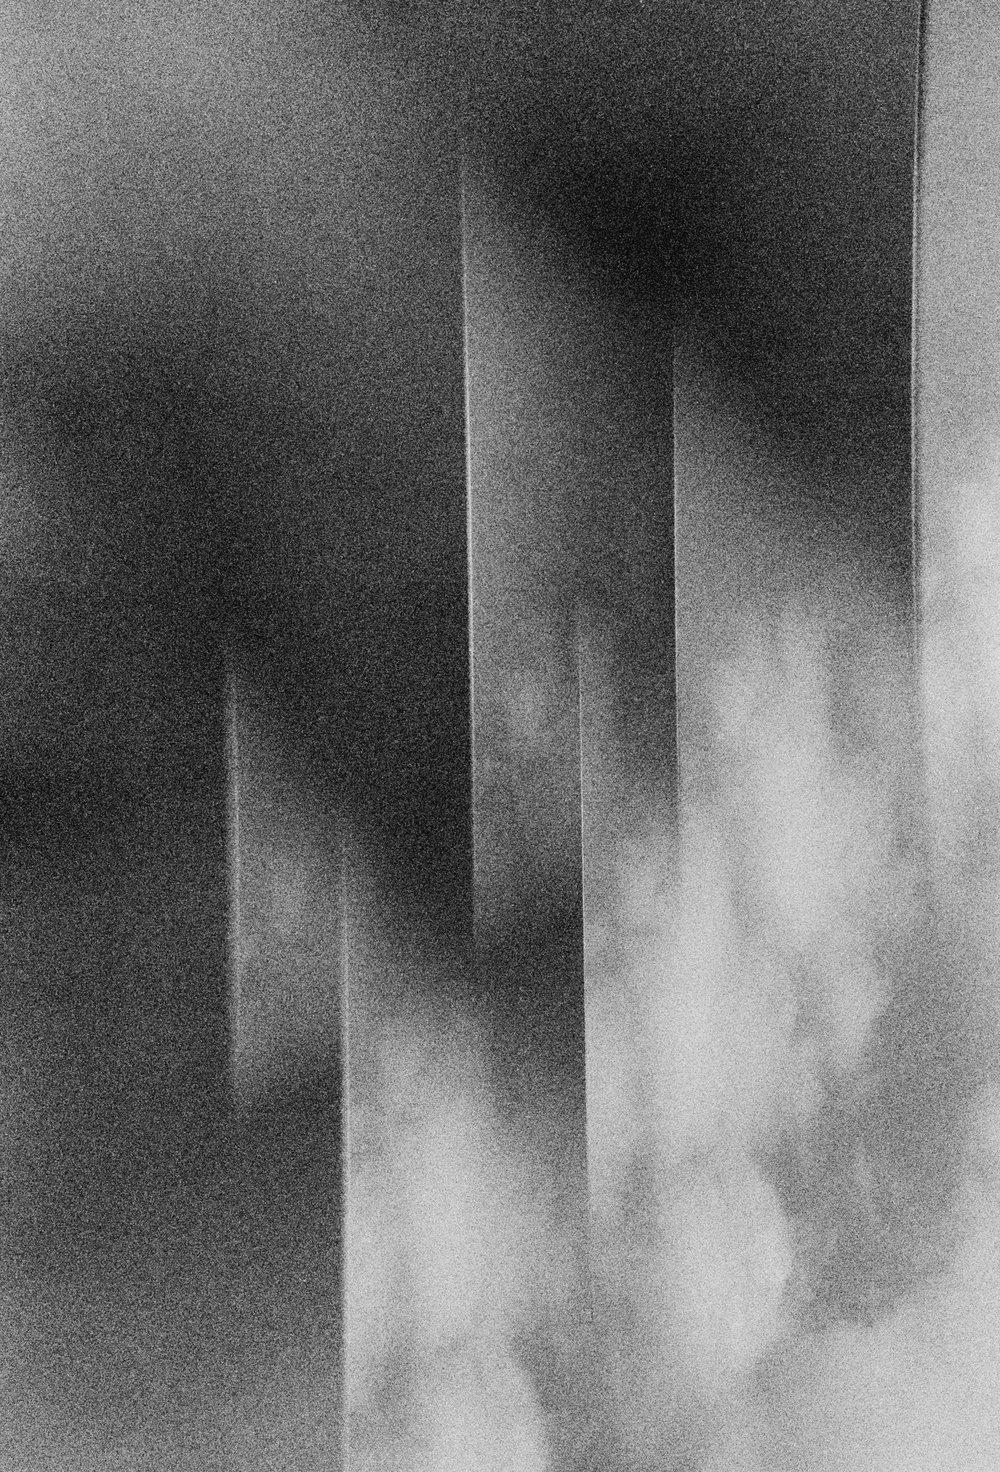 Alexis Dubourdieu - PRISMA - vertical sky.jpg